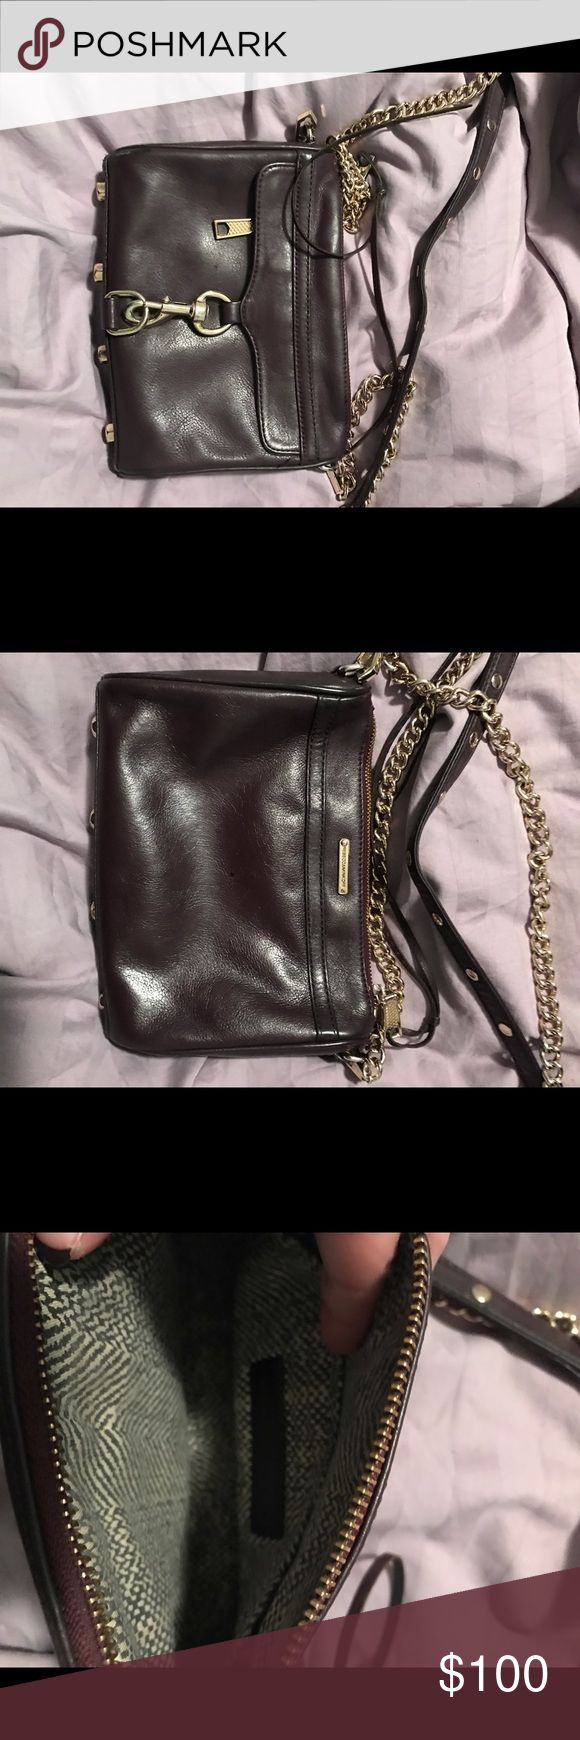 Rebecca minkoff mini Mac burgundy 100% authentic Rebecca Minkoff Bags Crossbody Bags